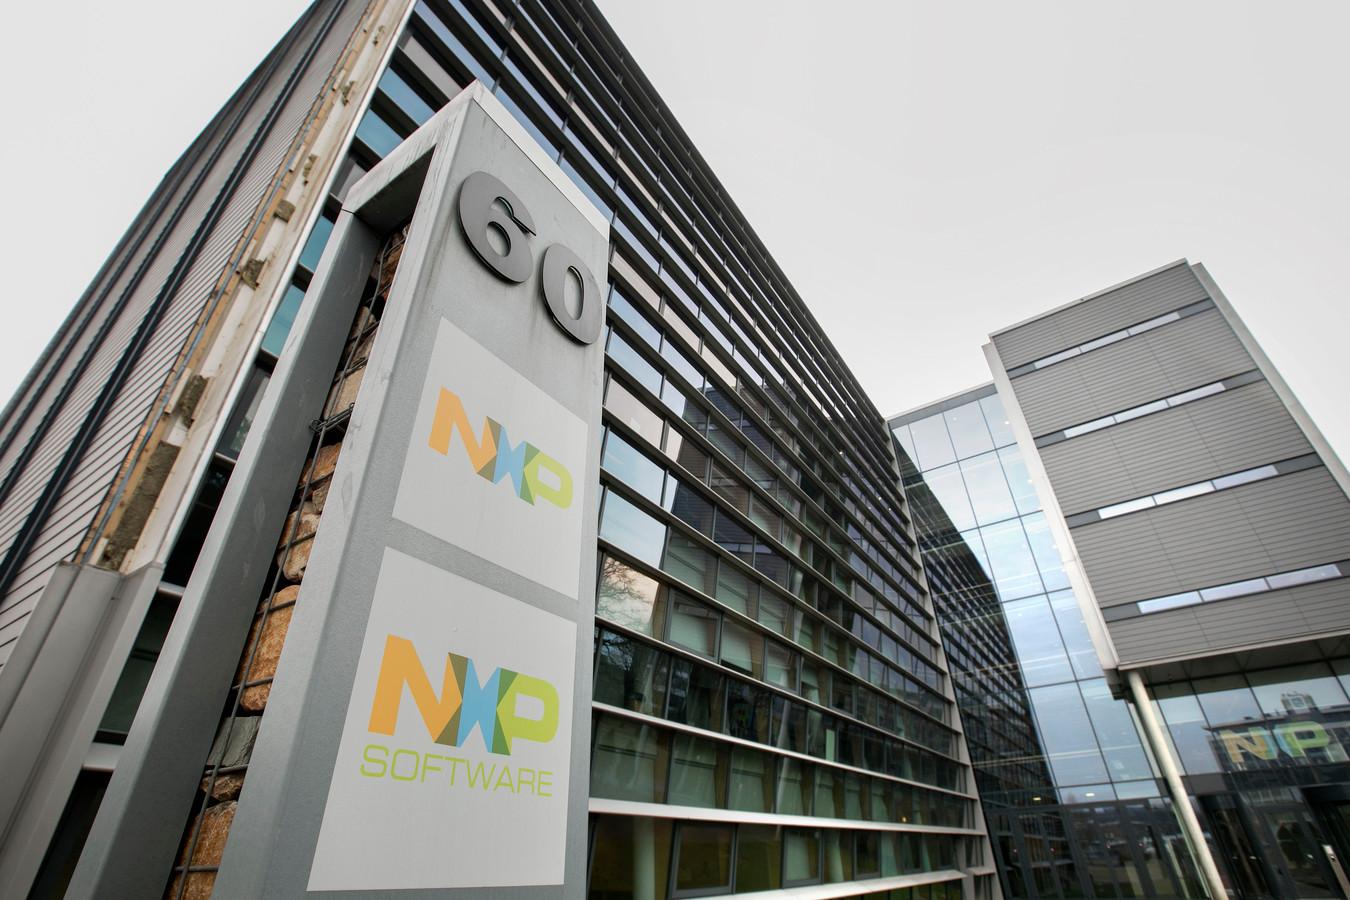 NXP op de High Tech Campus in Eindhoven.